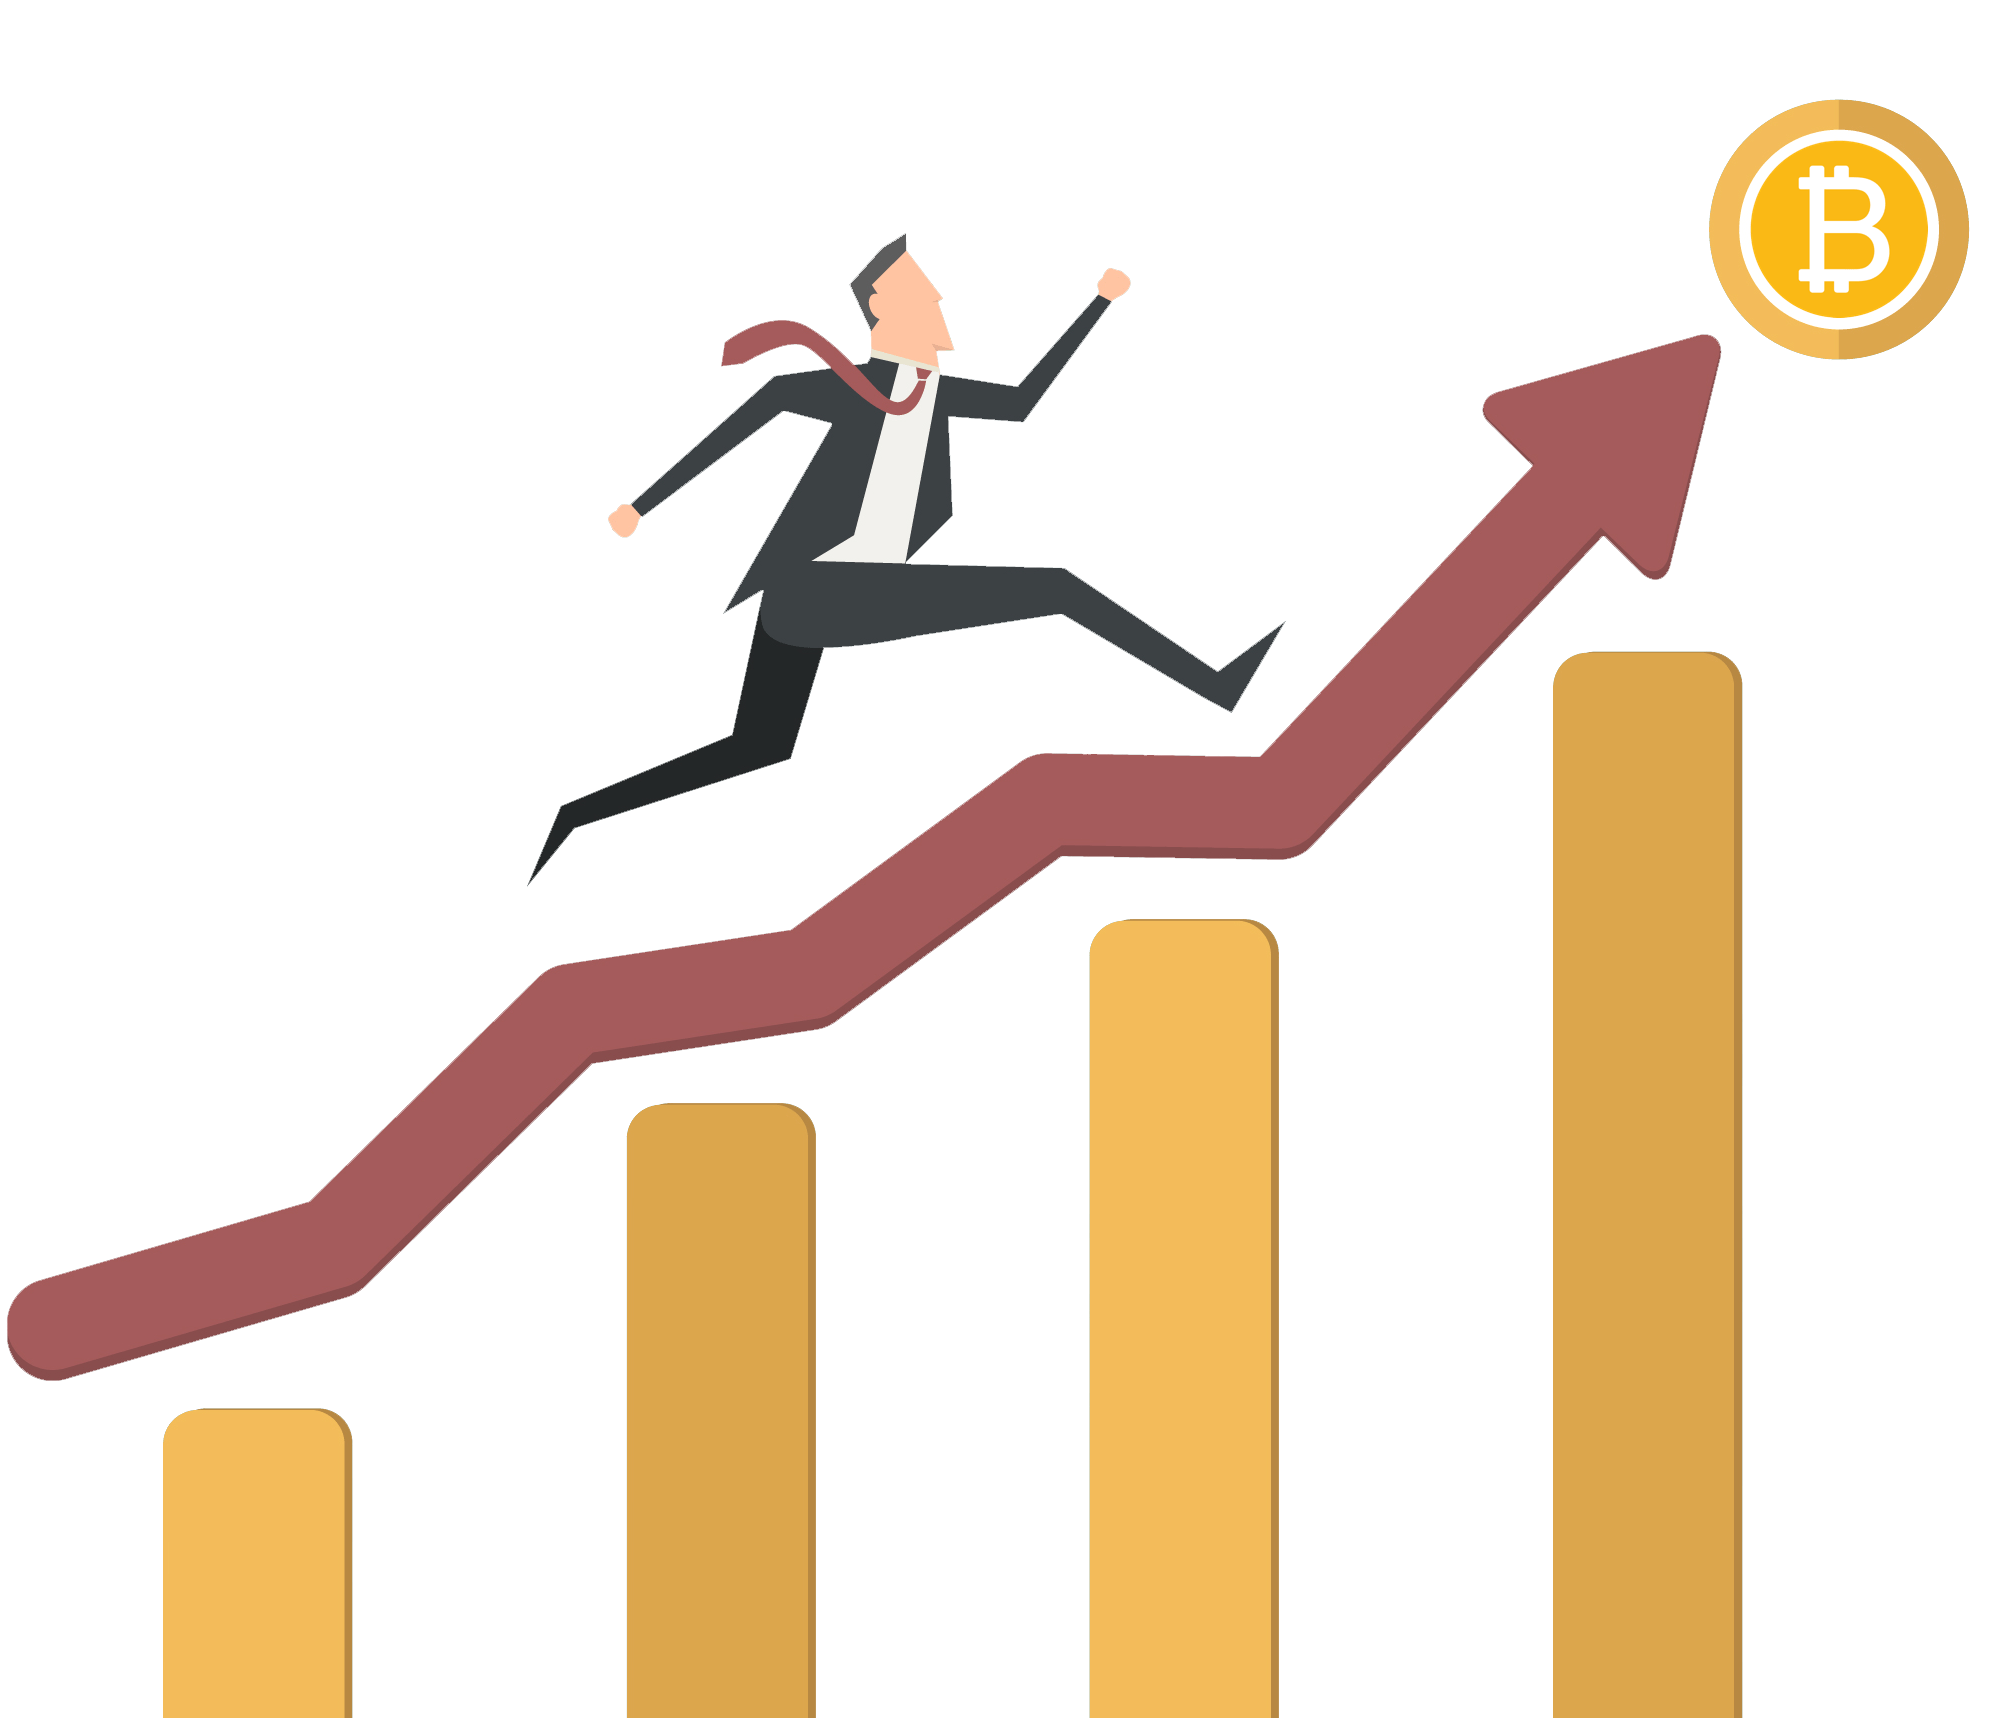 best bitcoin trading broker oanda forex login tron crypto investing